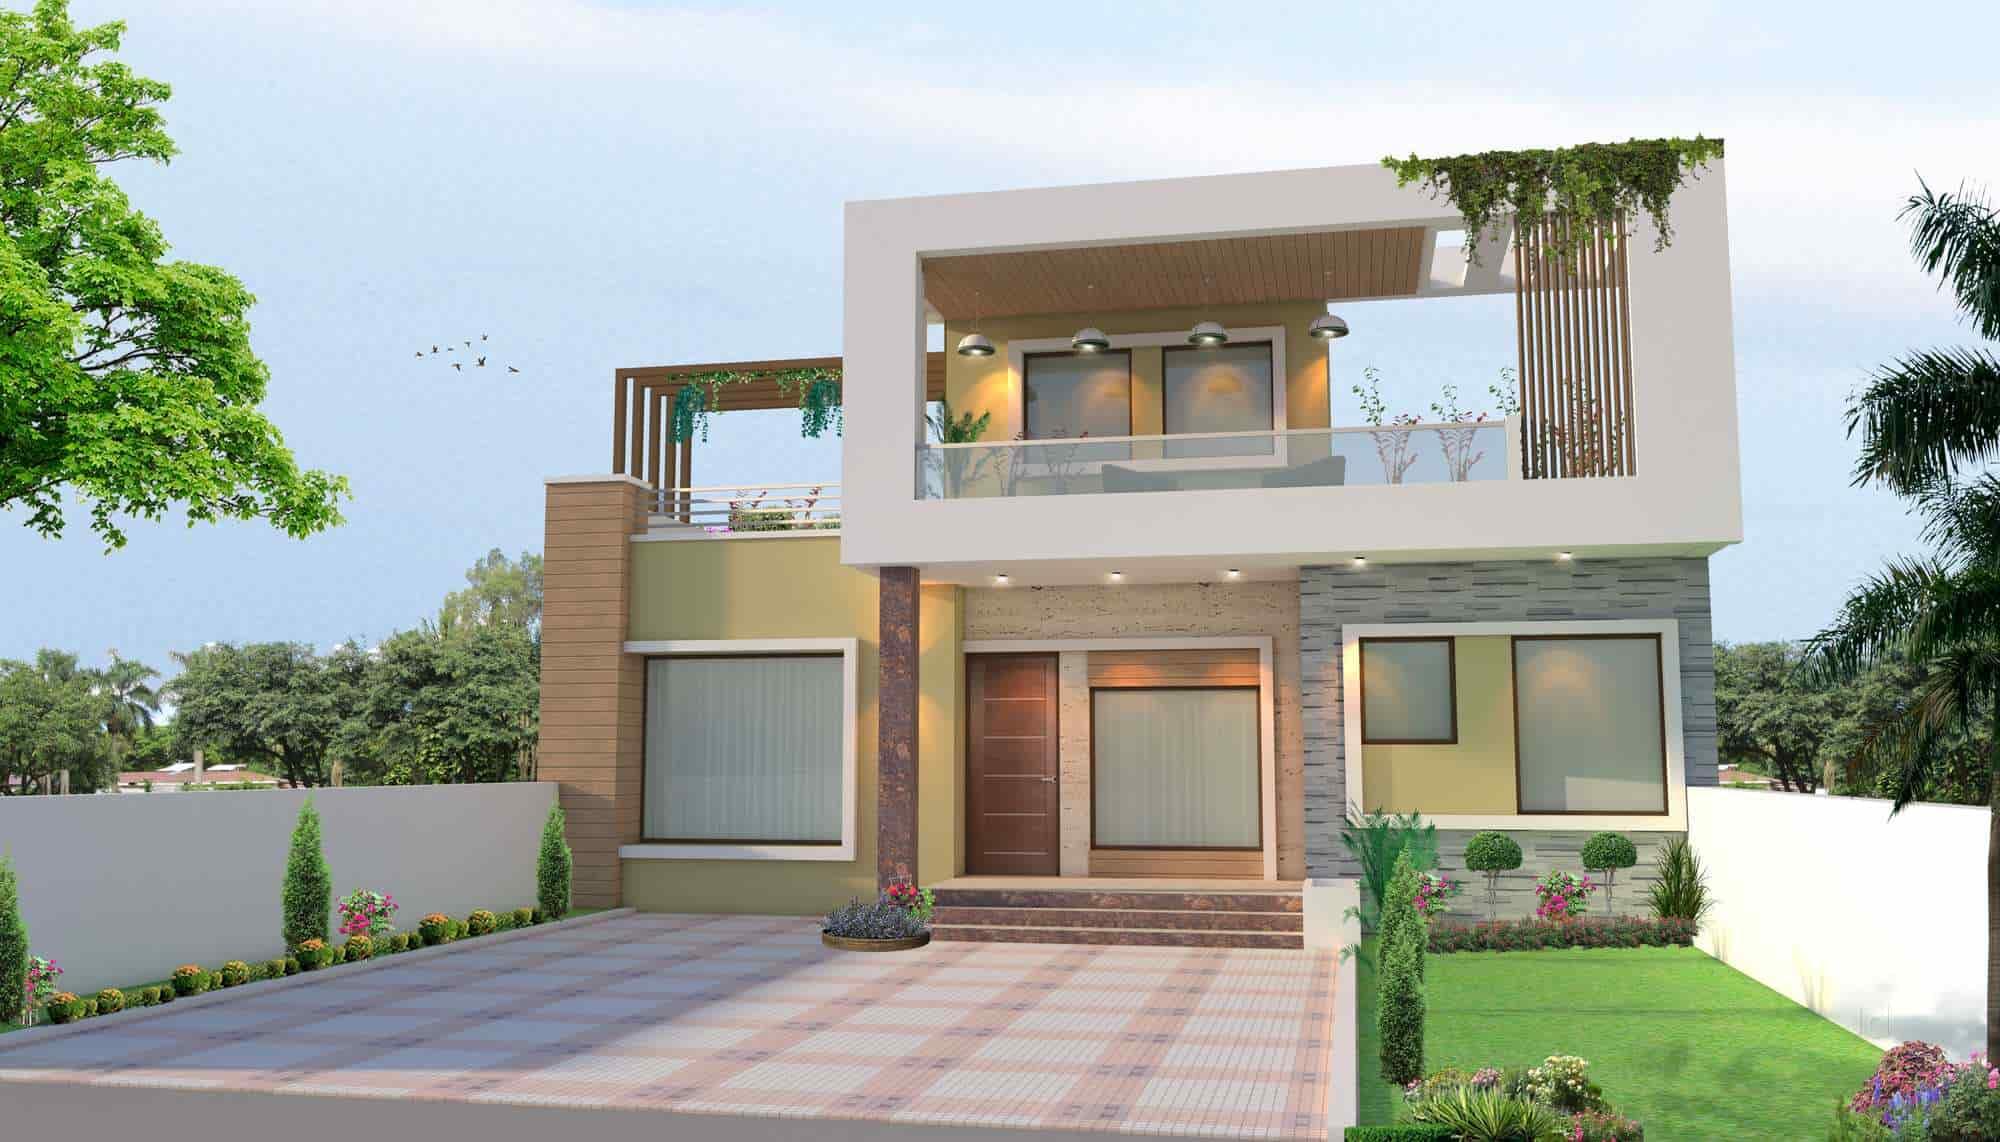 11 arch studio panchkula architects in chandigarh justdial